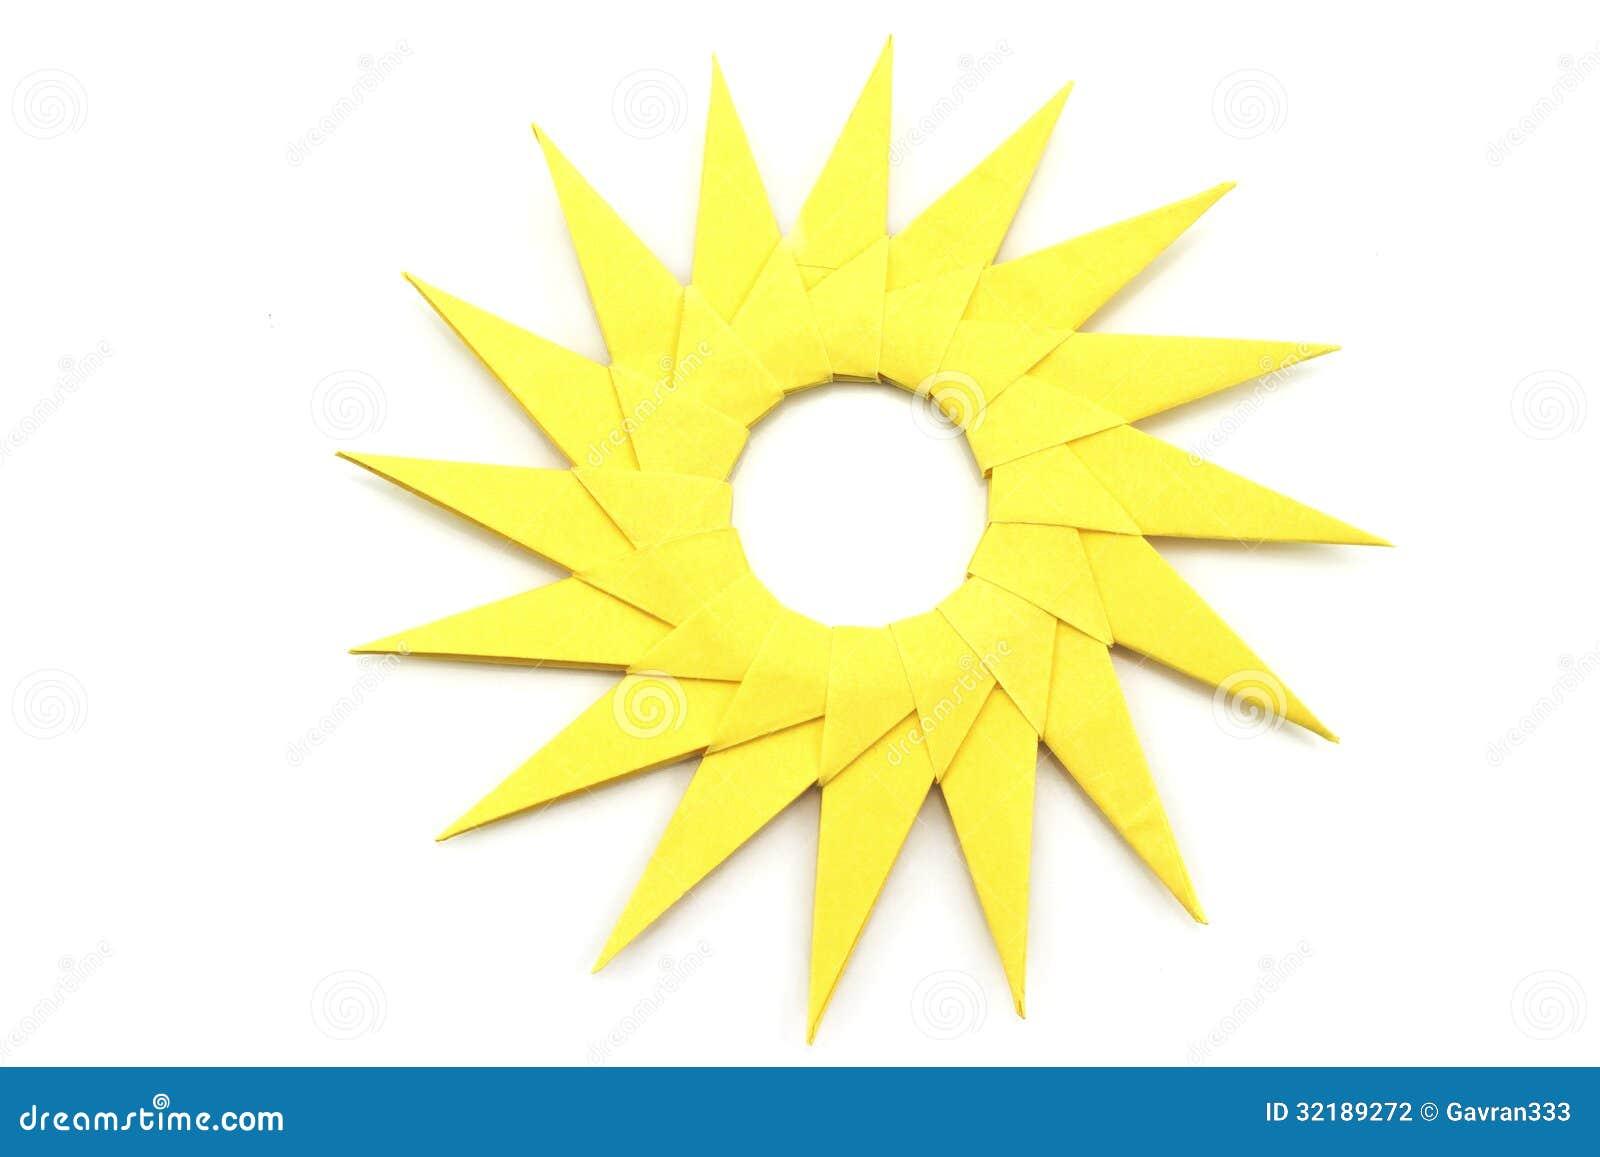 Origami Yellow Paper Sun Stock Photo Image Of Nature 32189272